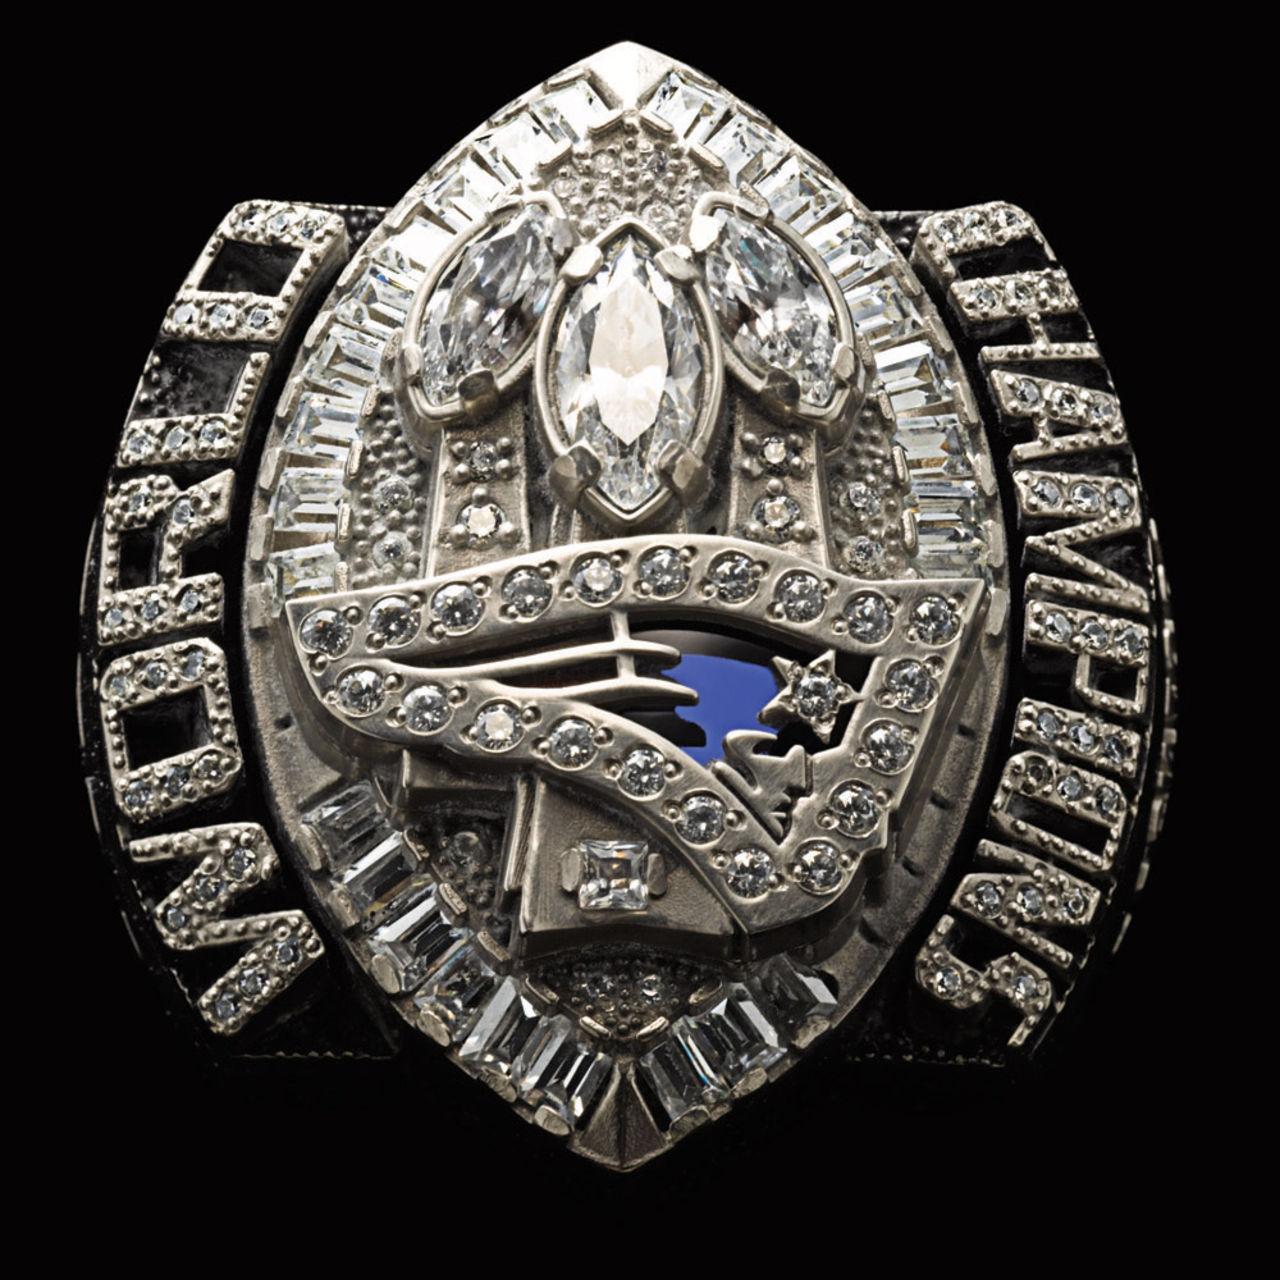 New England Patriots 2005 champions ring